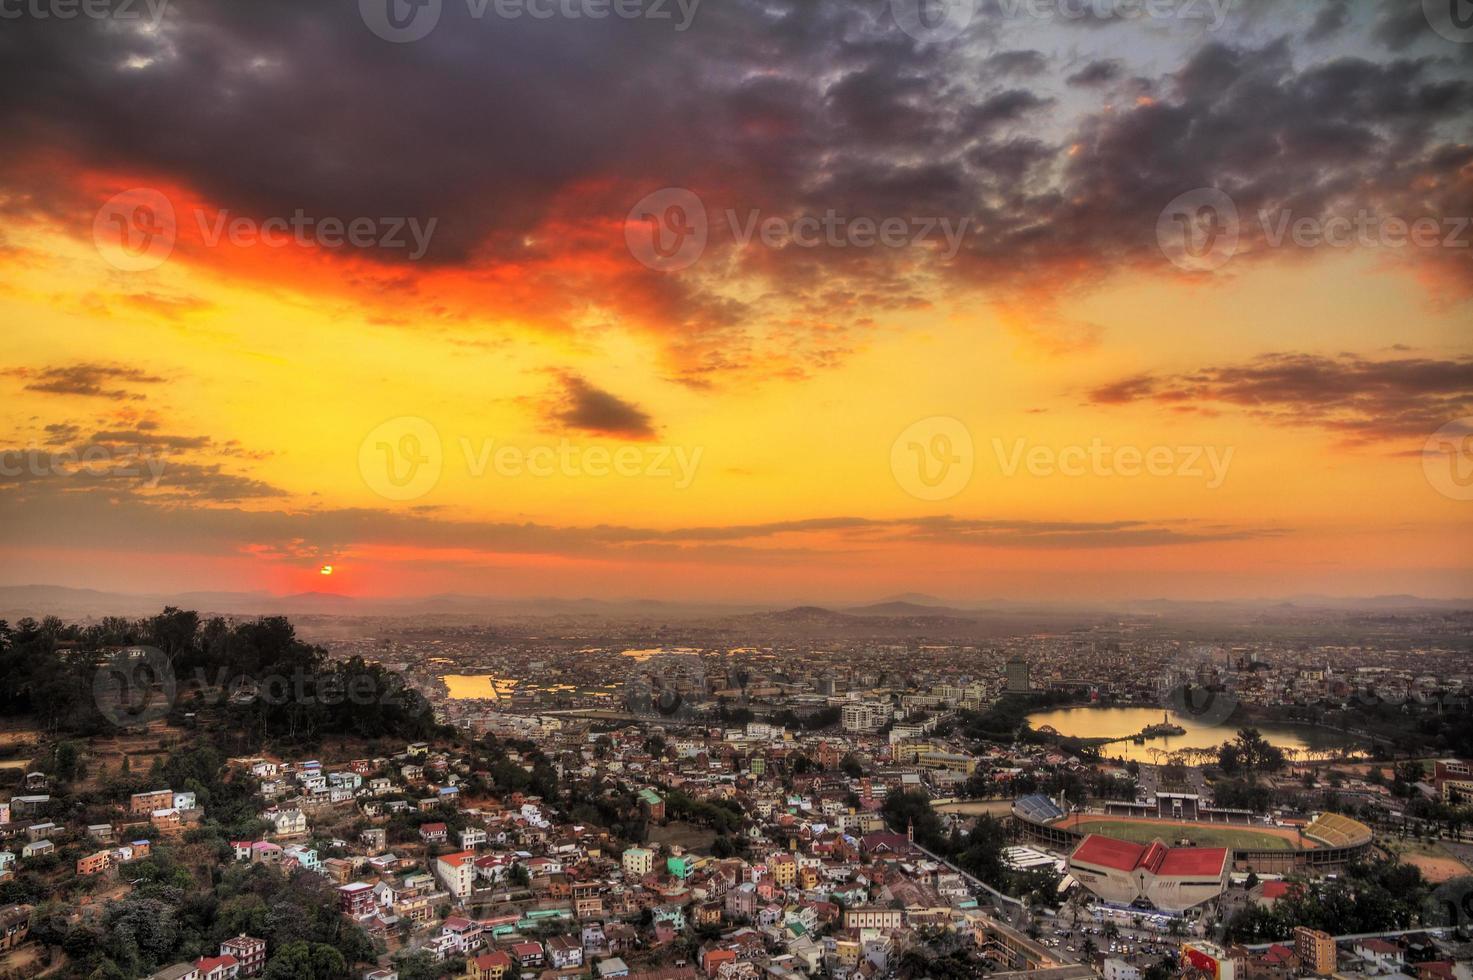 Tana lebendiger Sonnenuntergang foto